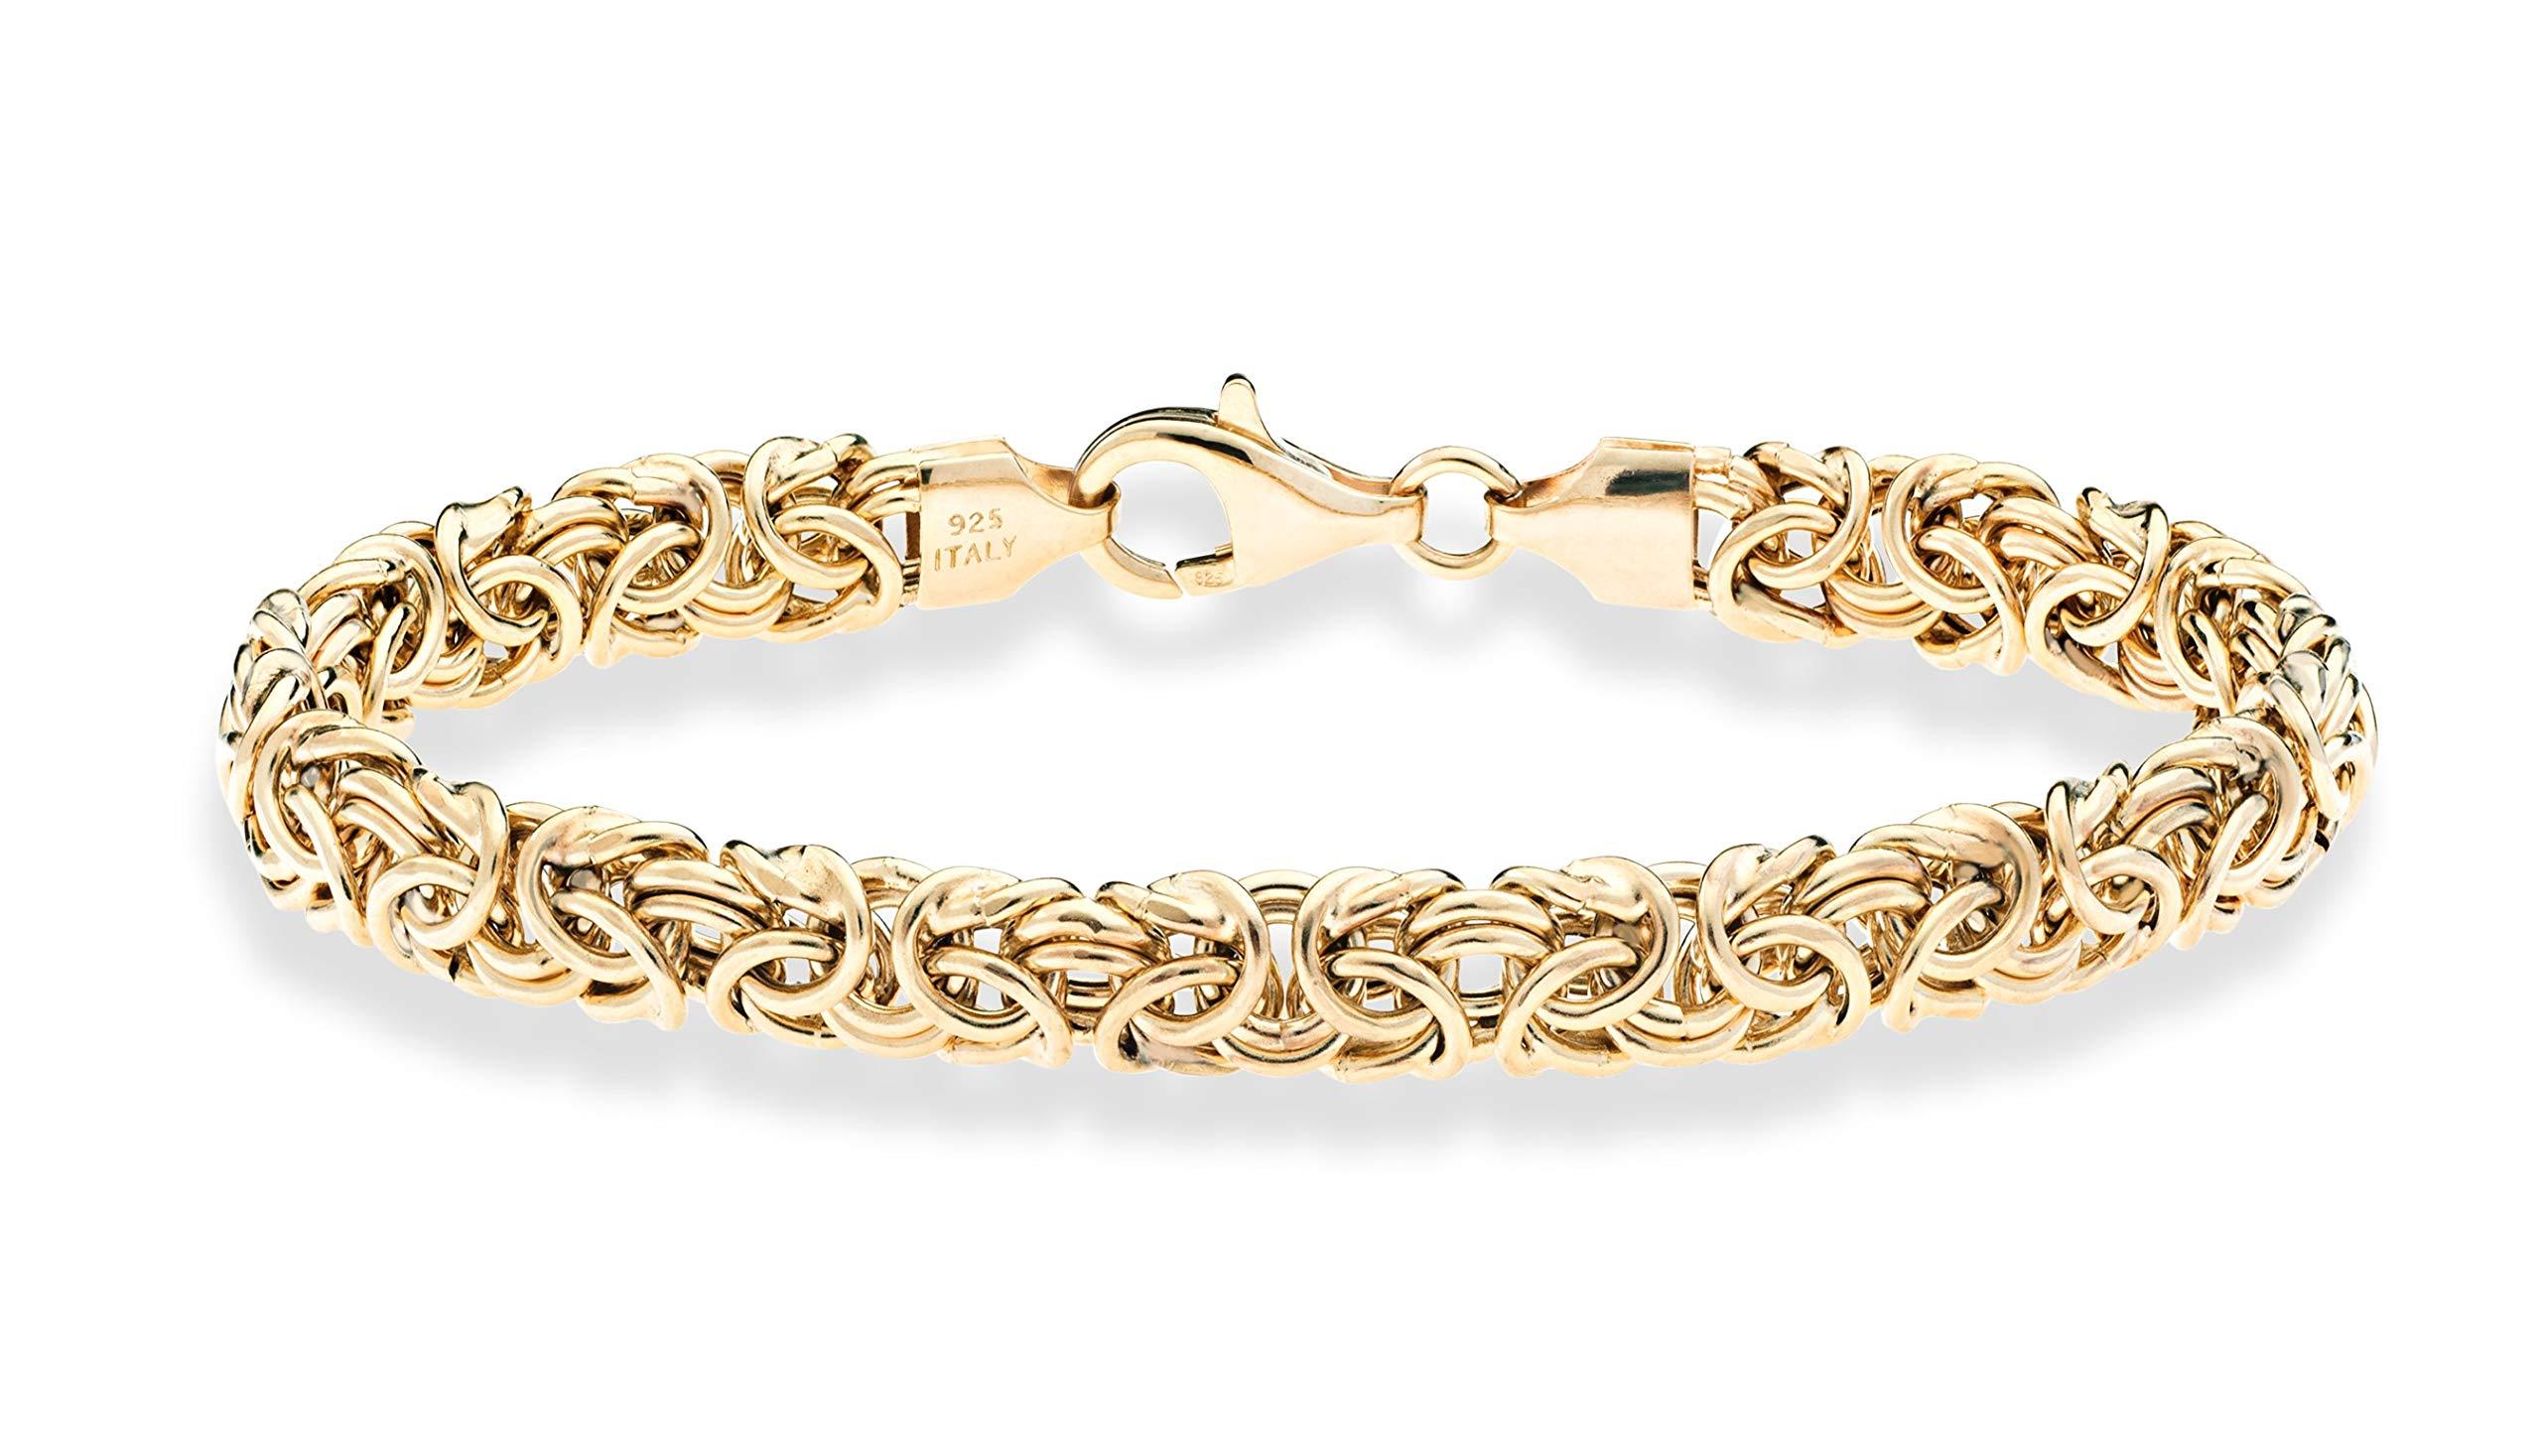 MiaBella 18K Gold Over Sterling Silver Italian Byzantine Bracelet for Women 6.5, 7, 7.25, 7.5, 8 Inch 925 Handmade in Italy (8) by MiaBella